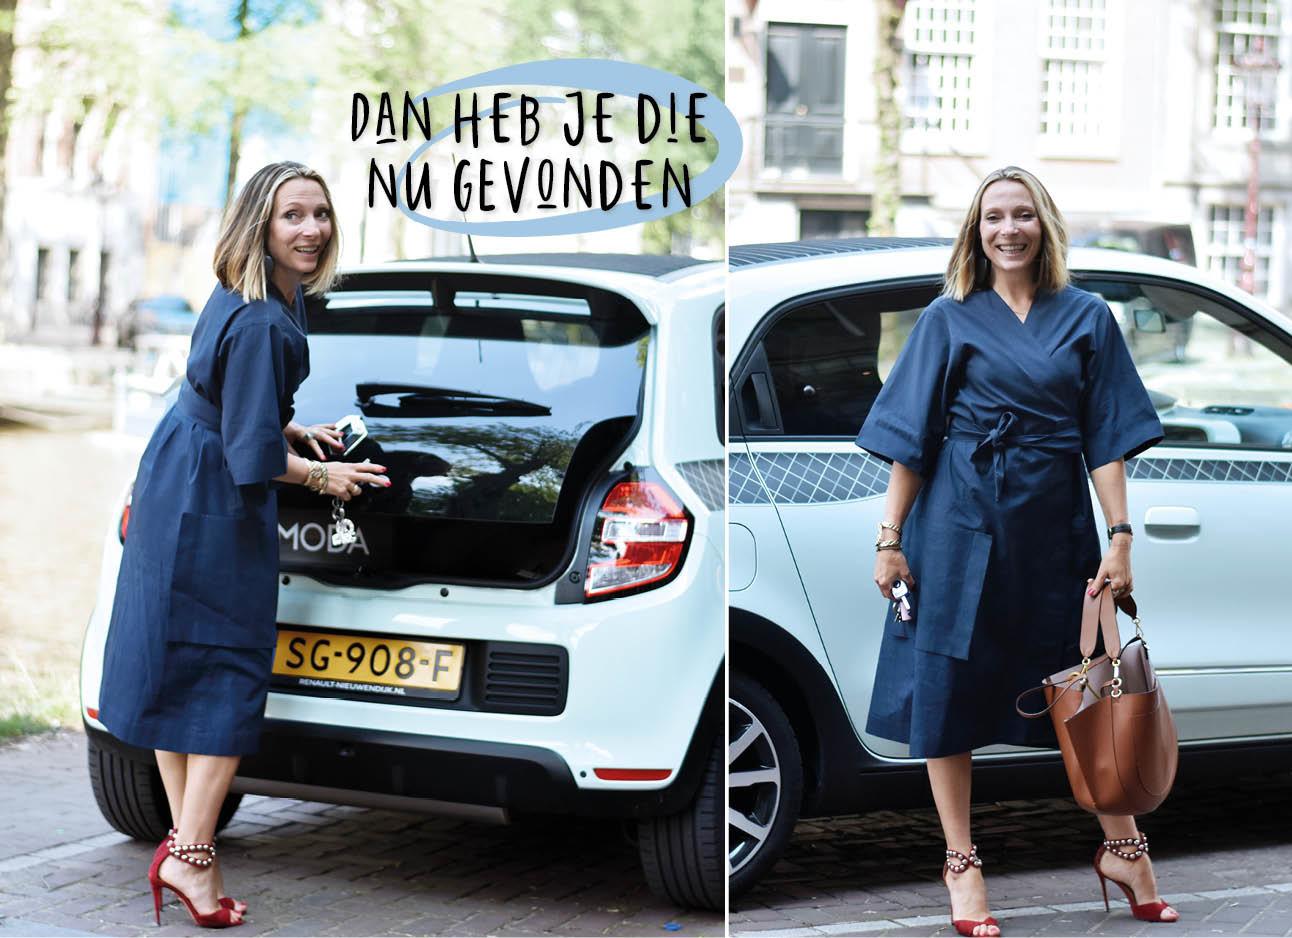 may-britt in een donker blauwe jurk met Mint kleur Renault Twingo in Amsterdam